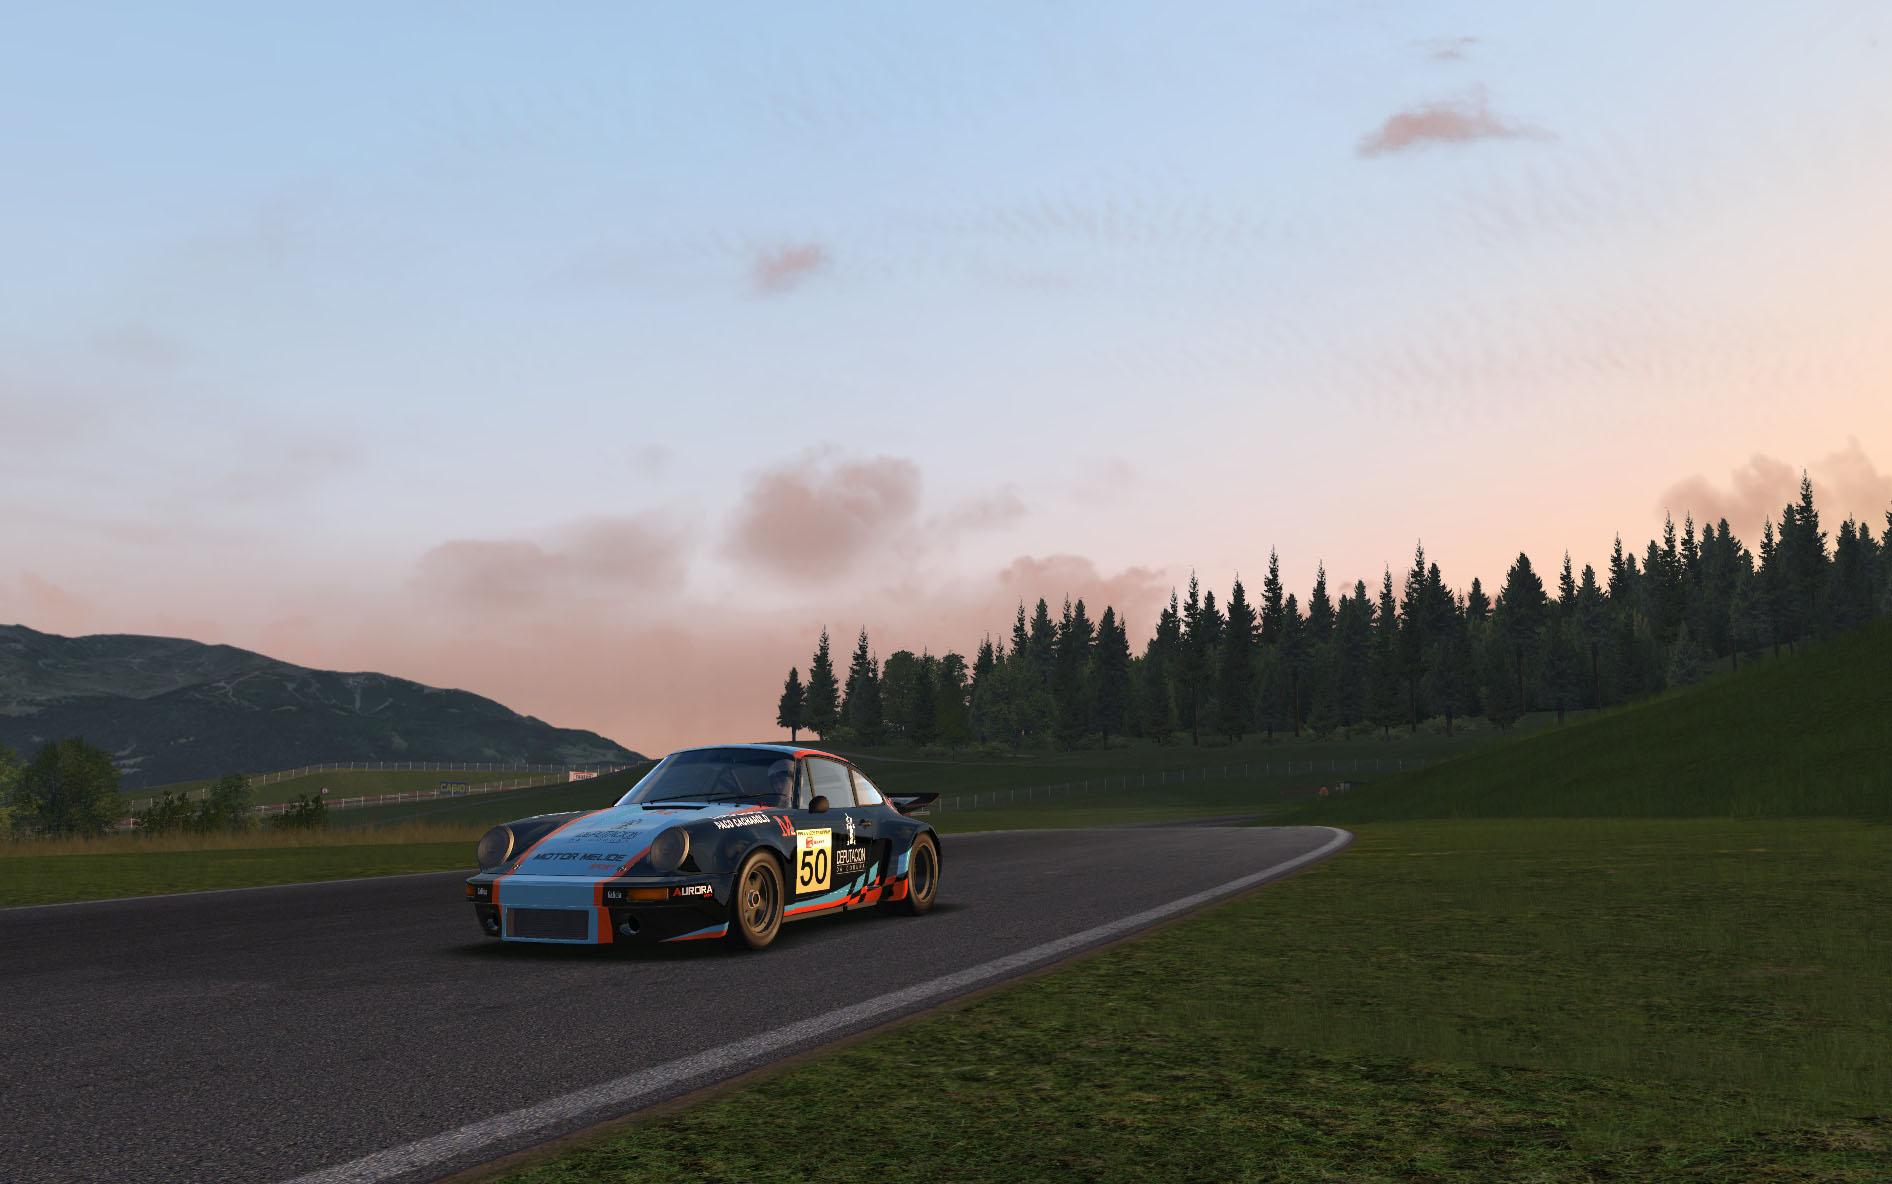 GSC 2013 Porsche 911 Cup RSR 3.0L v2.7